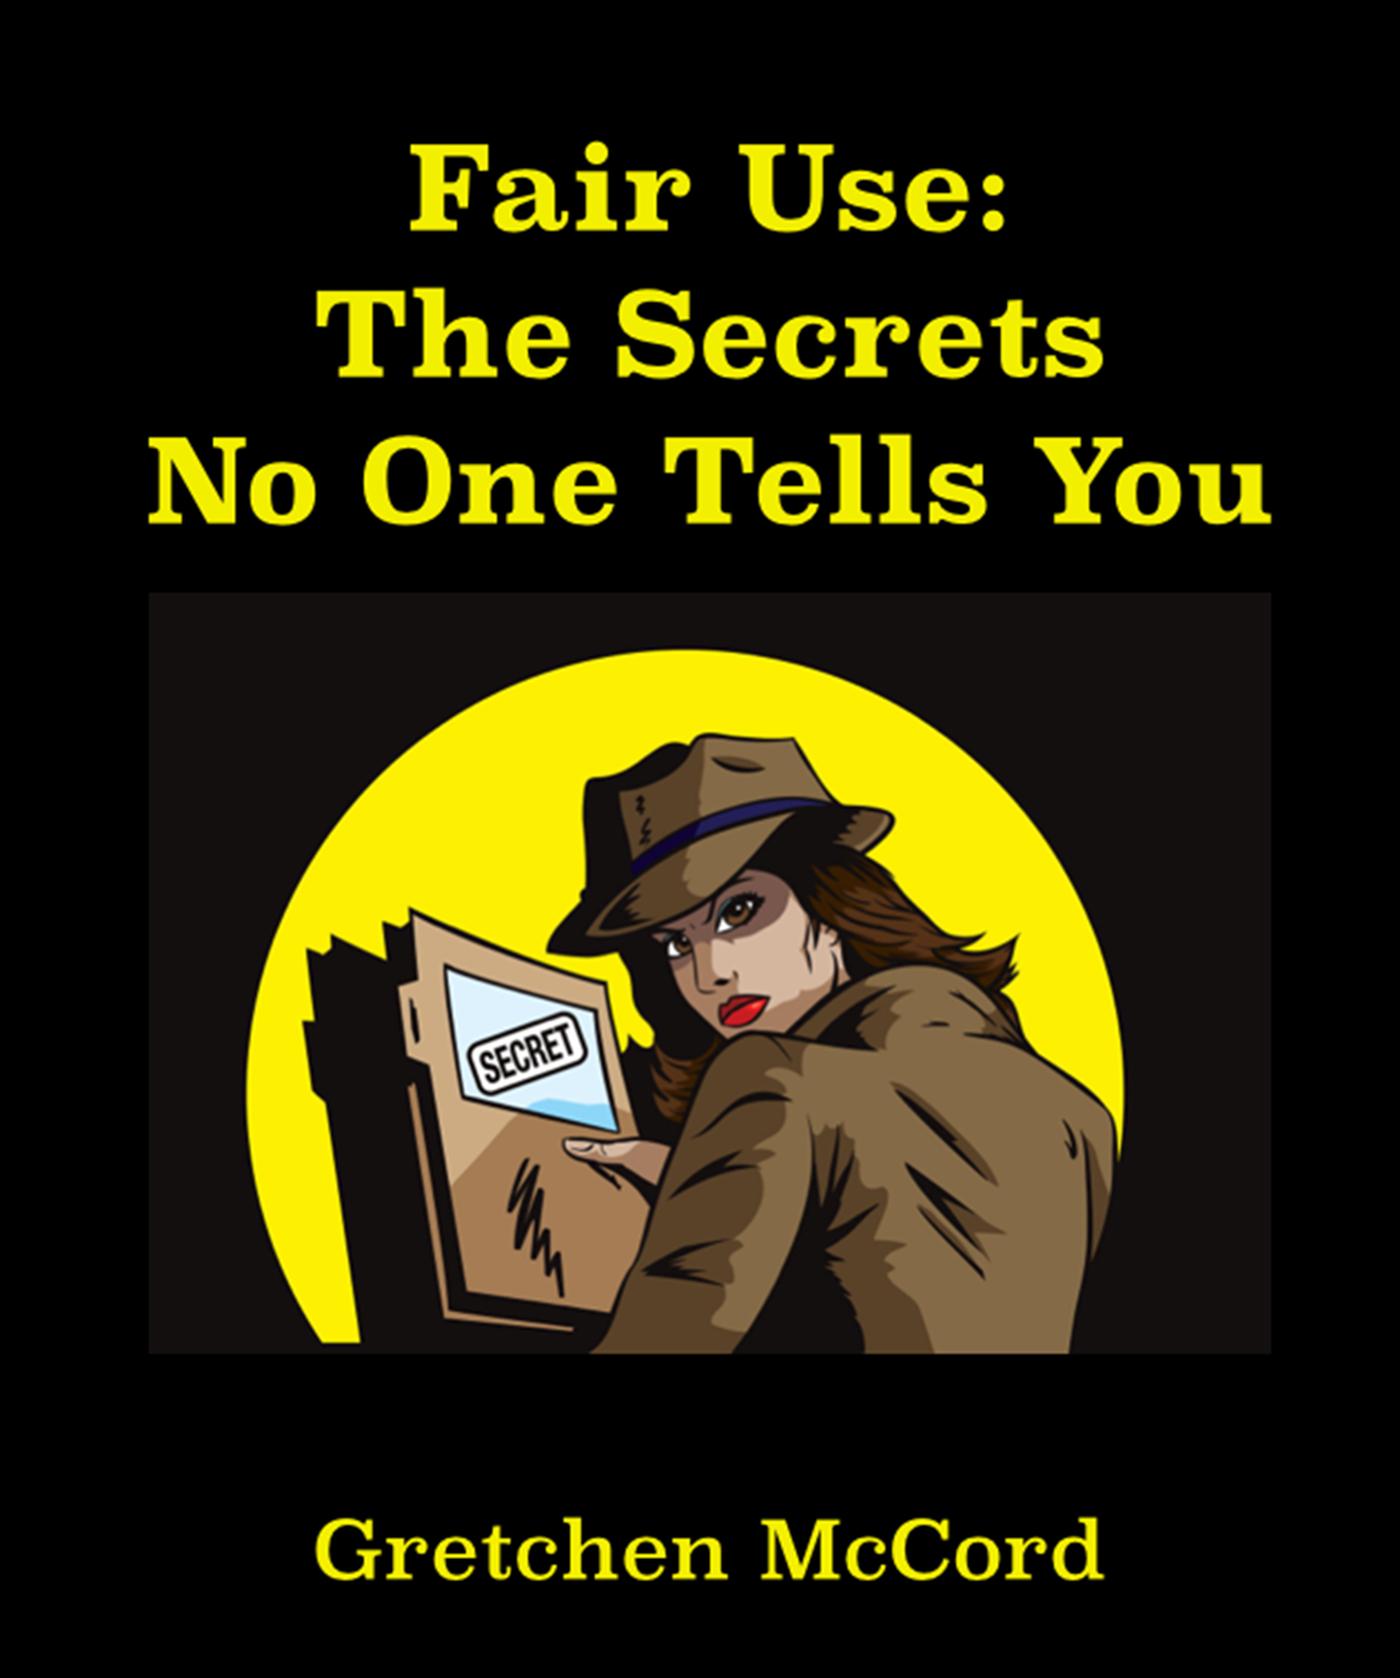 Book Cover Images Fair Use : Fair use the secrets no one tells you e book digital